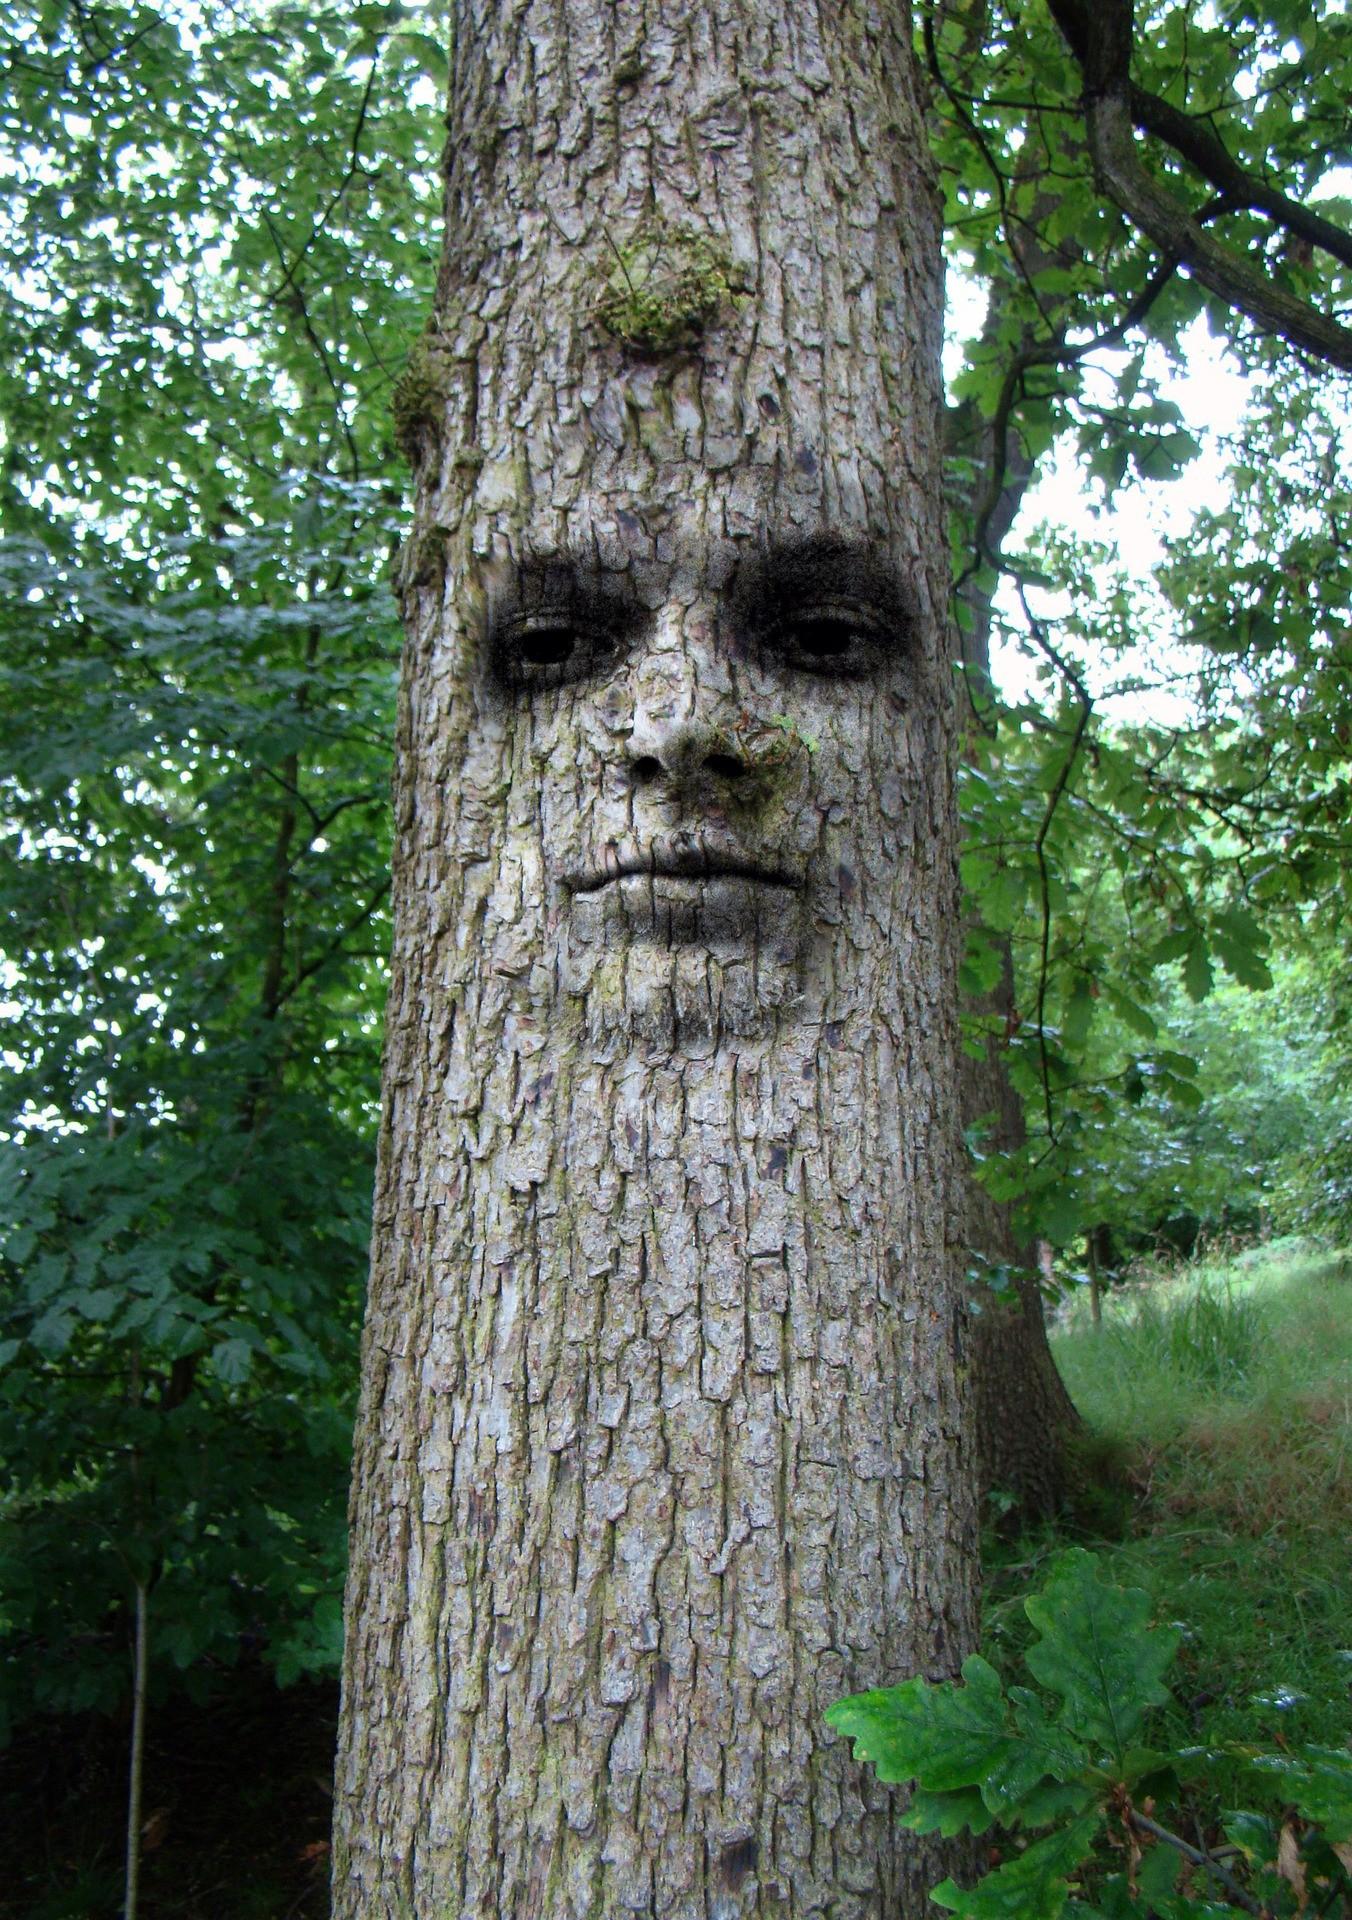 1596810718605633_by_hans3595_tree-1519868_1920